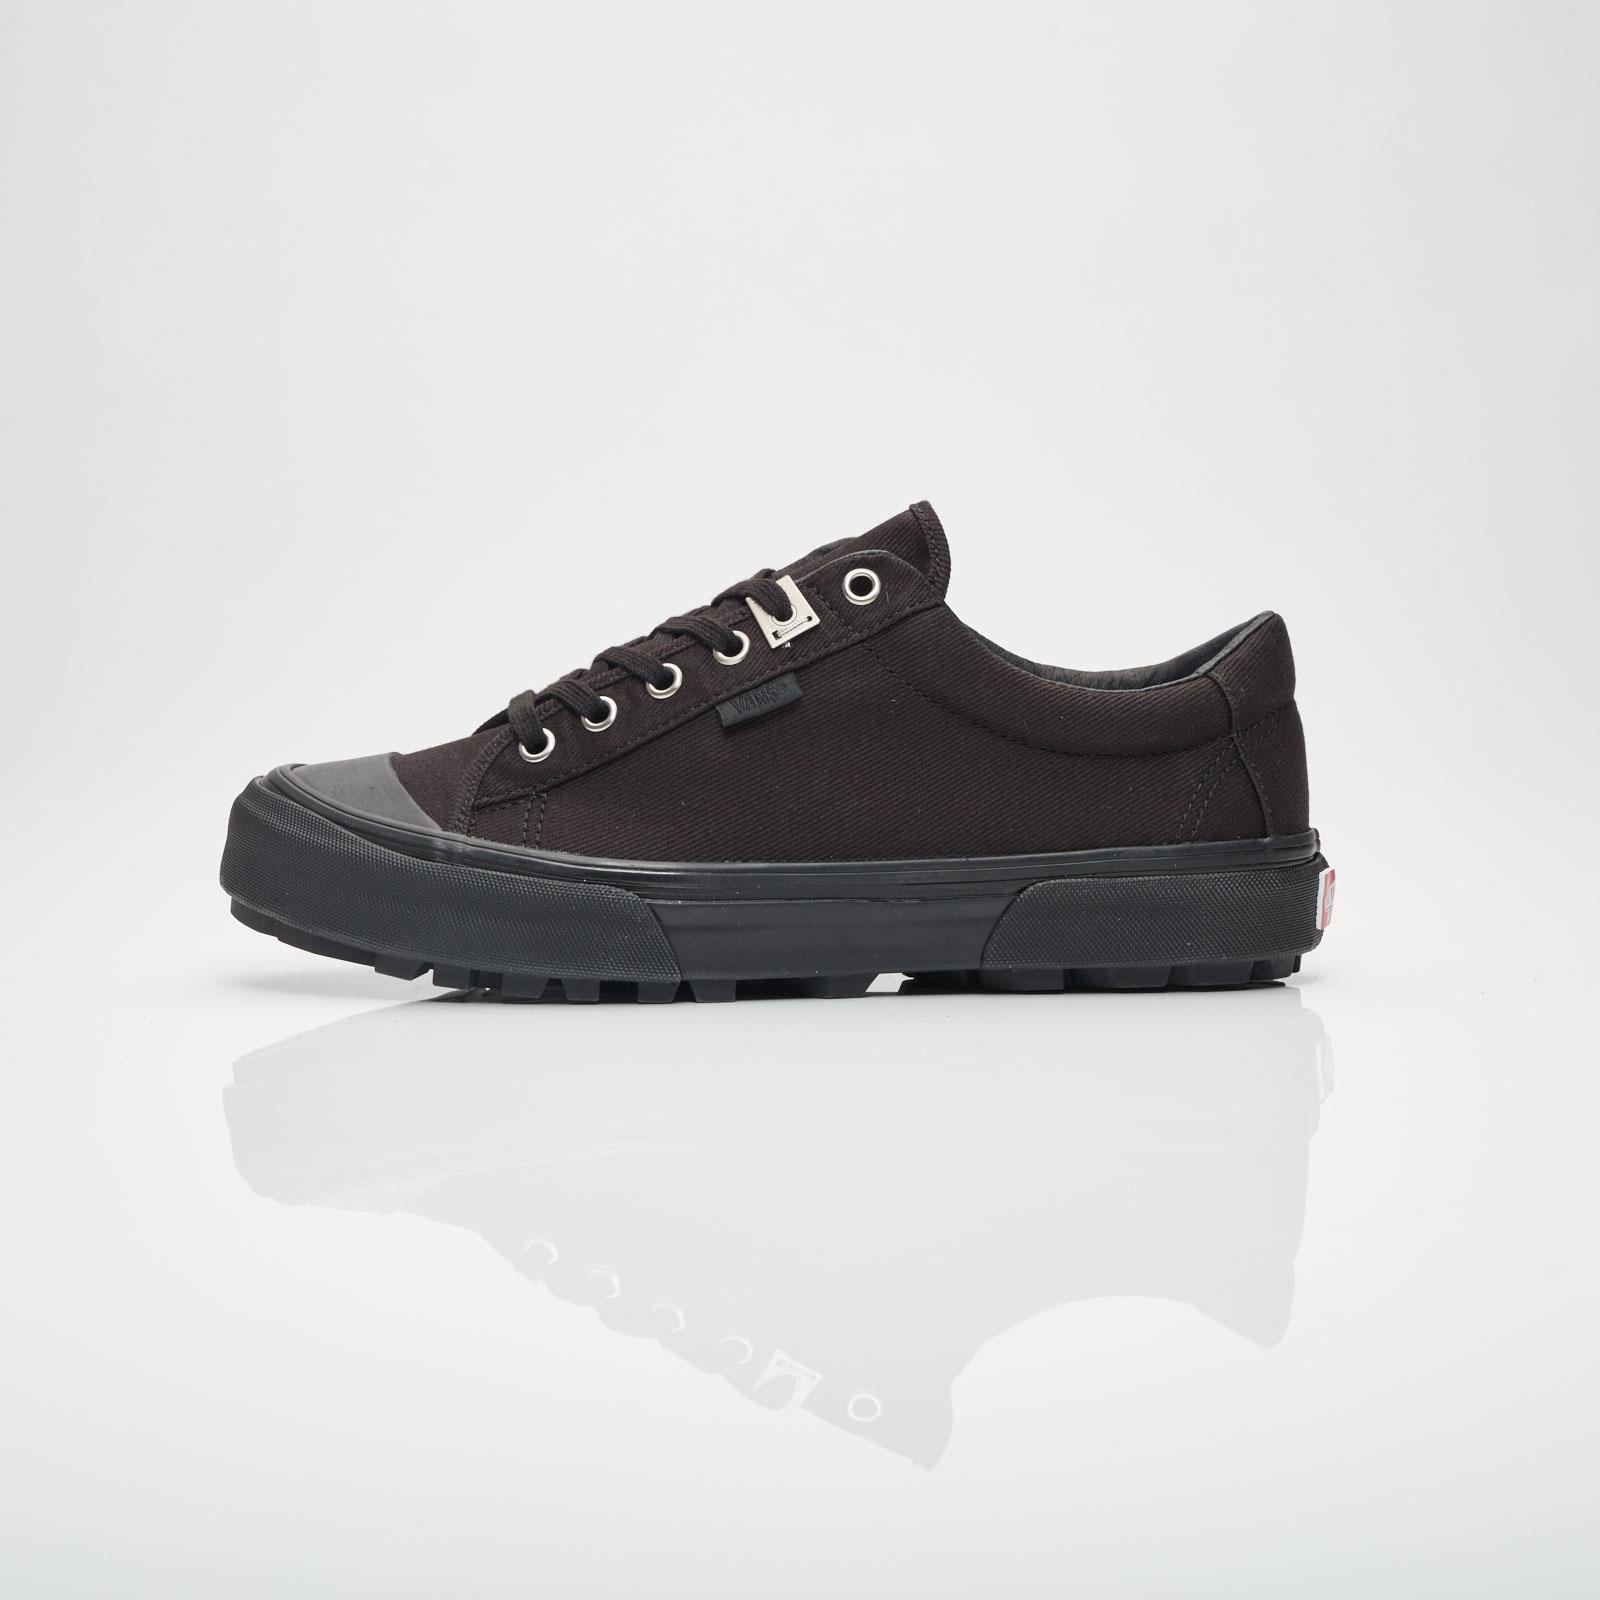 e4927c9c7a Vans UA Style 29 LX x ALYX - Vn0a3dpaok6 - Sneakersnstuff